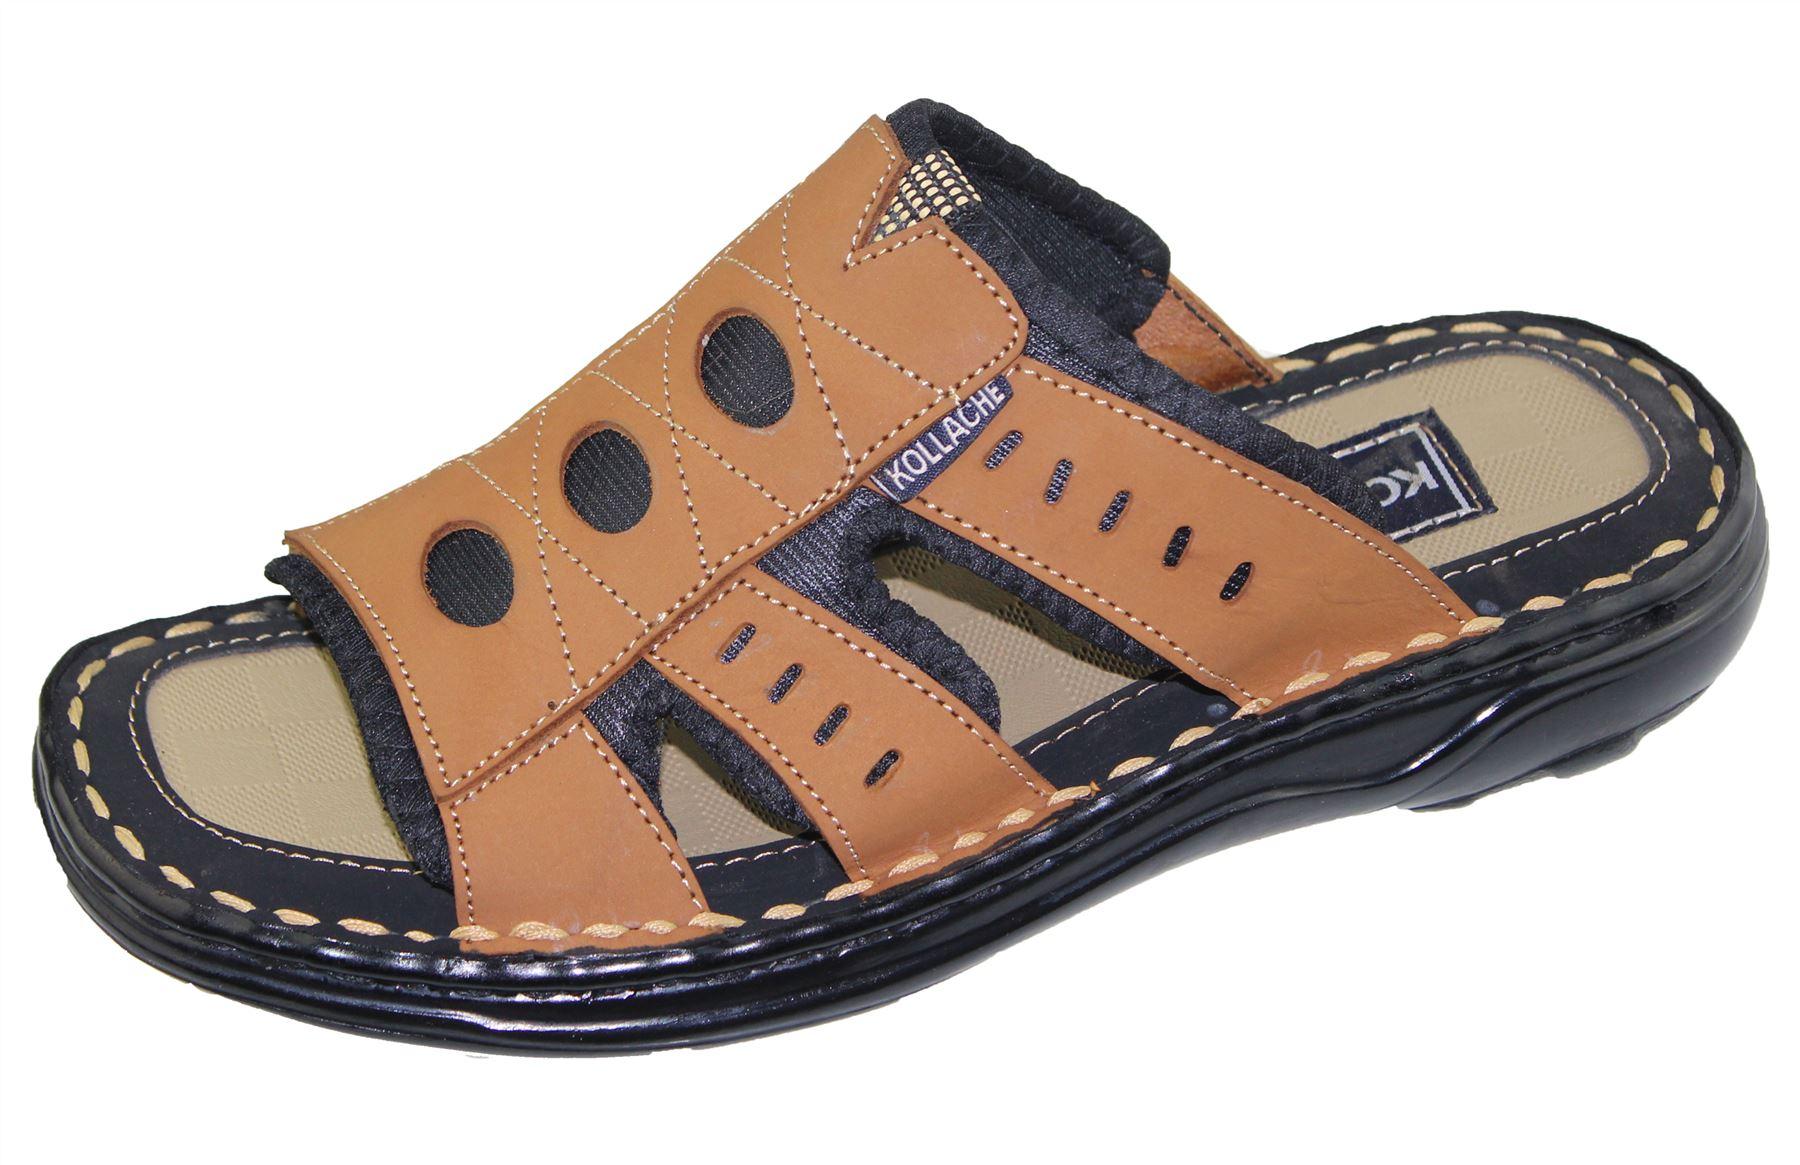 Mens-Slipper-Sandal-Sports-Beach-Buckle-Walking-Fashion-Summer-Casual-Shoes-Size miniatura 30